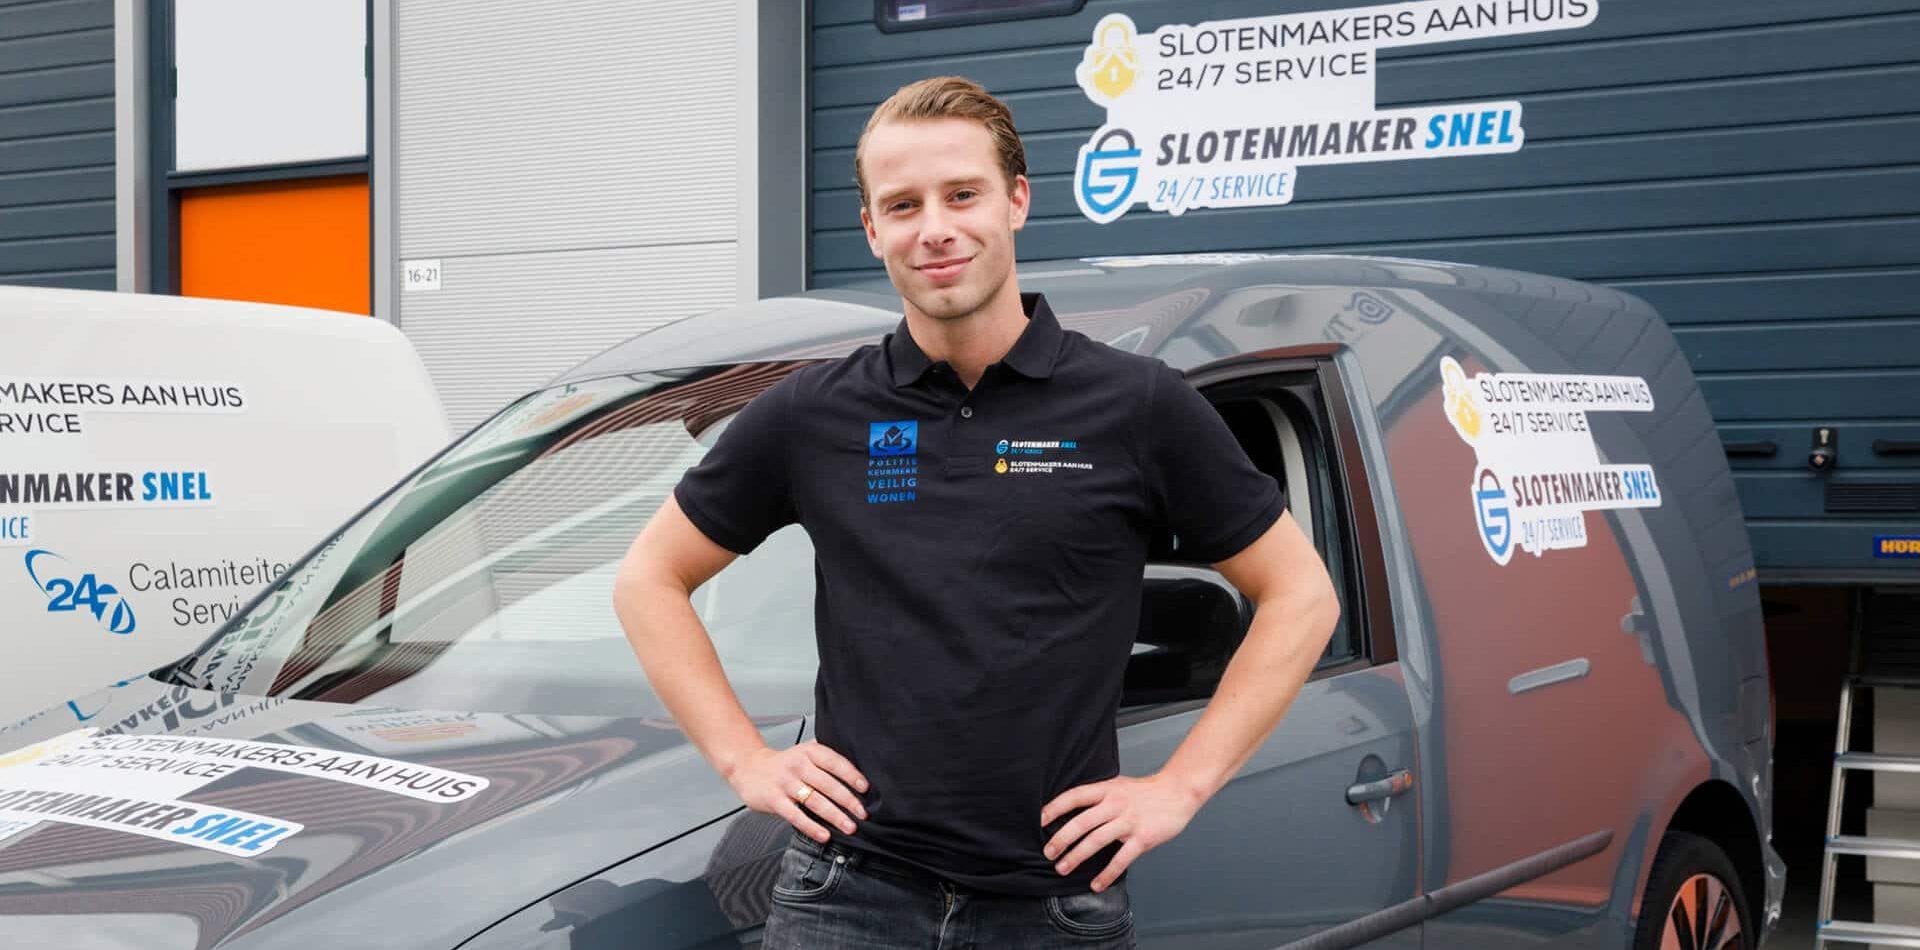 Slotenmaker Weesp